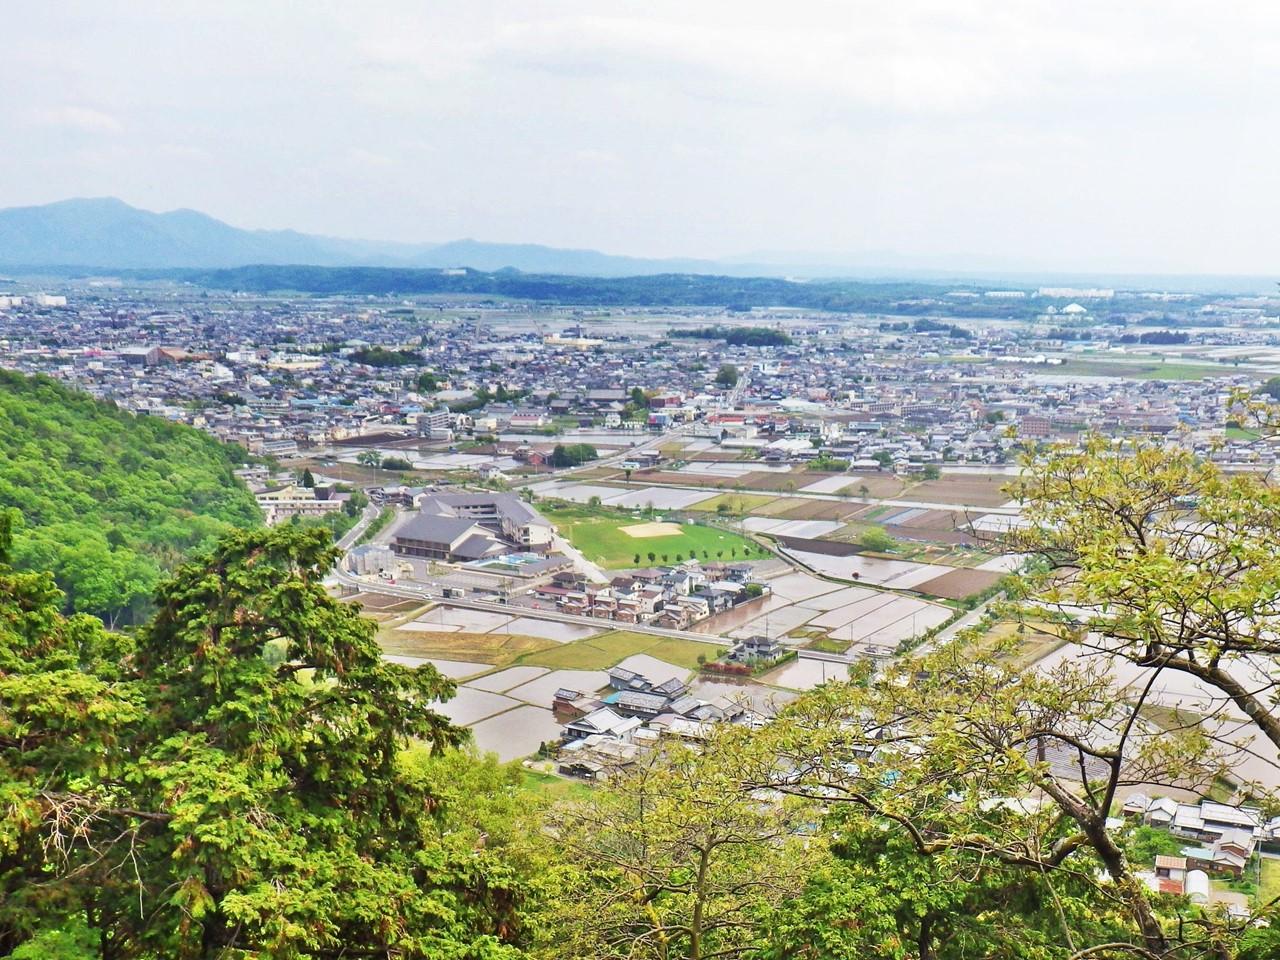 18b 太郎坊宮からの眺め